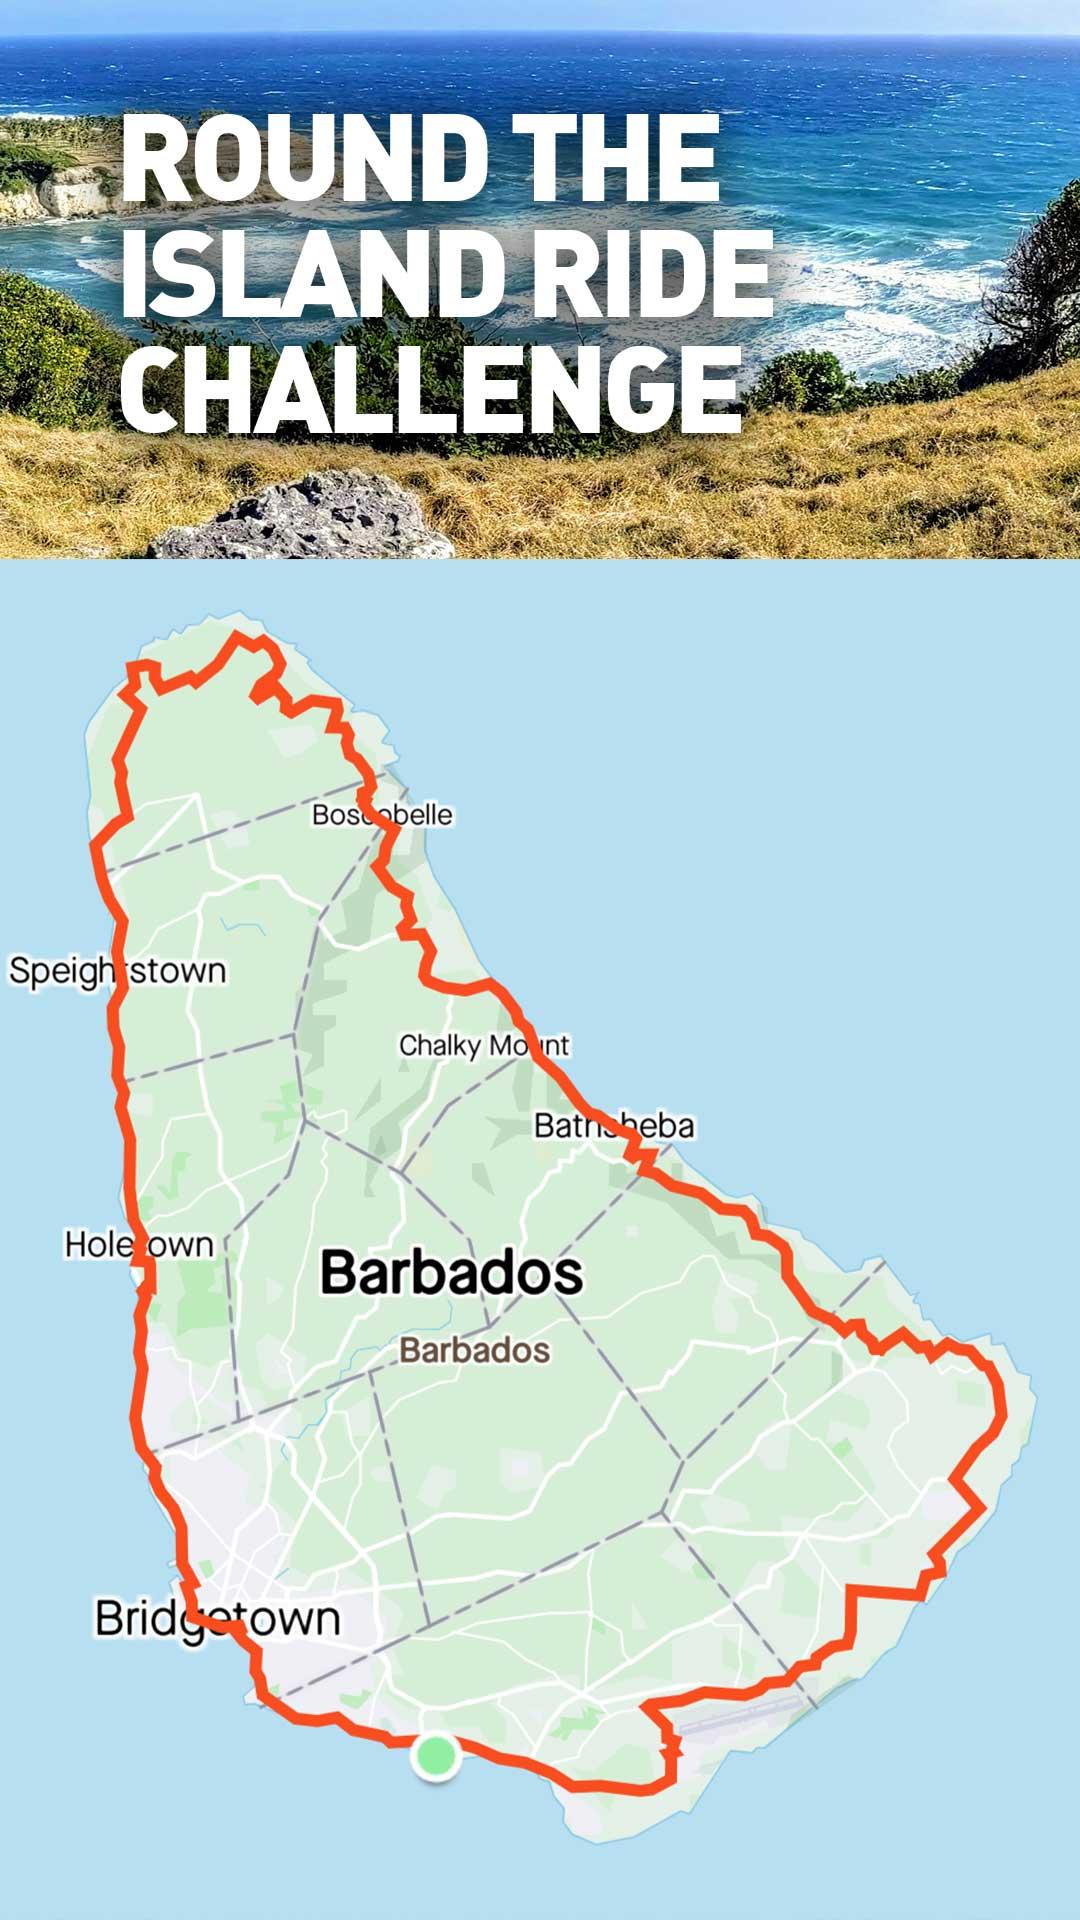 Barbados Great Adventure Tour